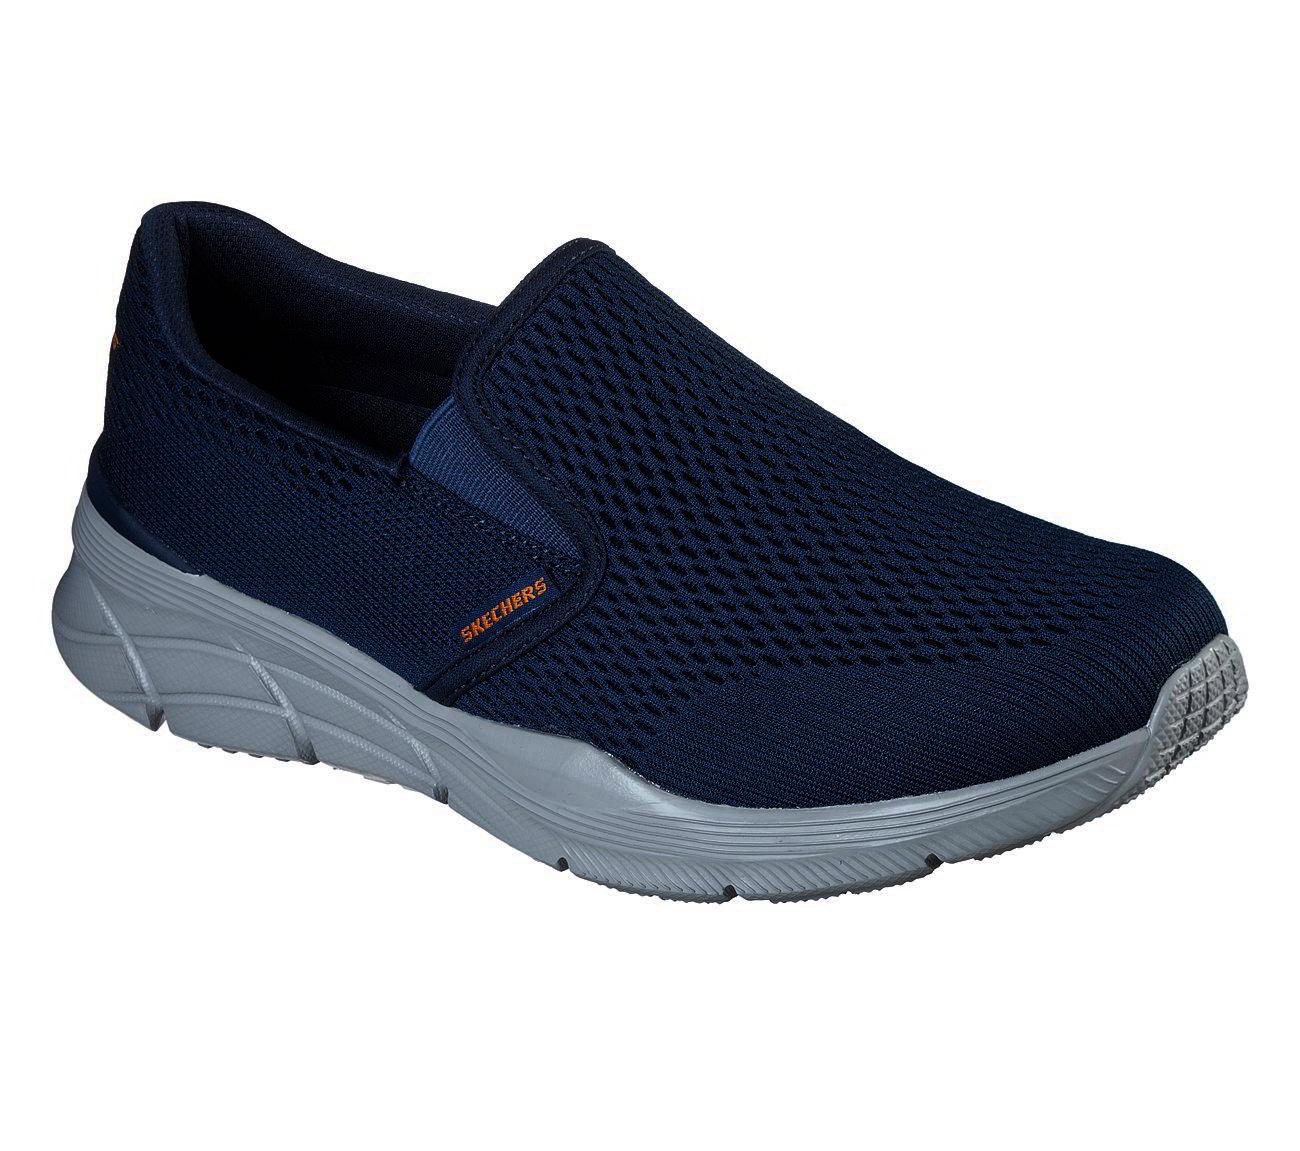 Skechers Mens Equalizer 4.0 Triple Play Shoes - Navy Orange